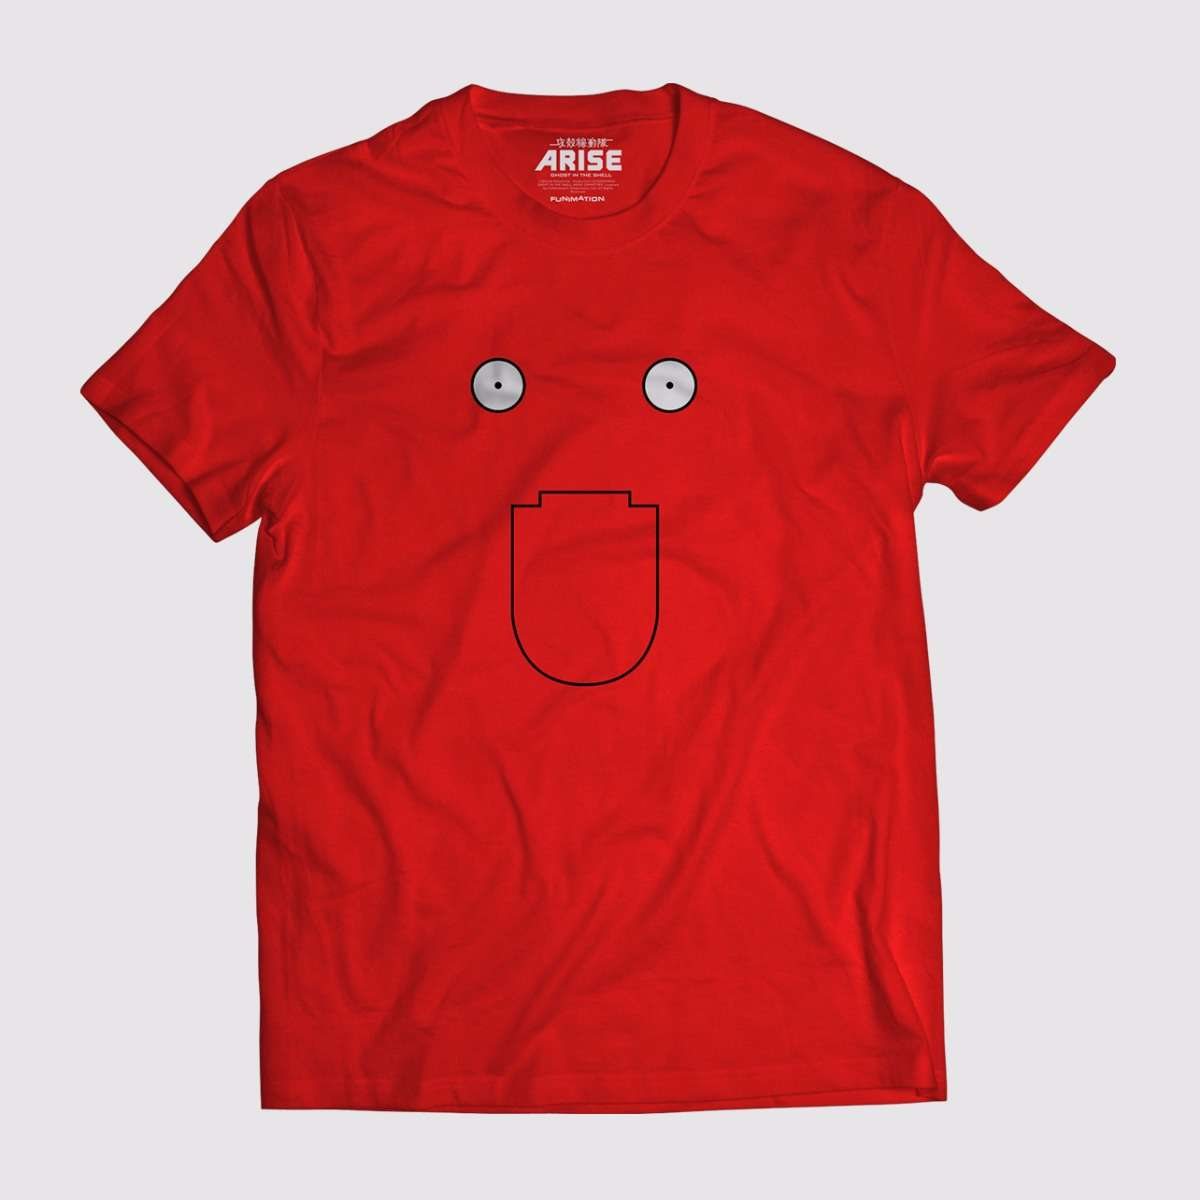 T-shirt - Logicoma apparel